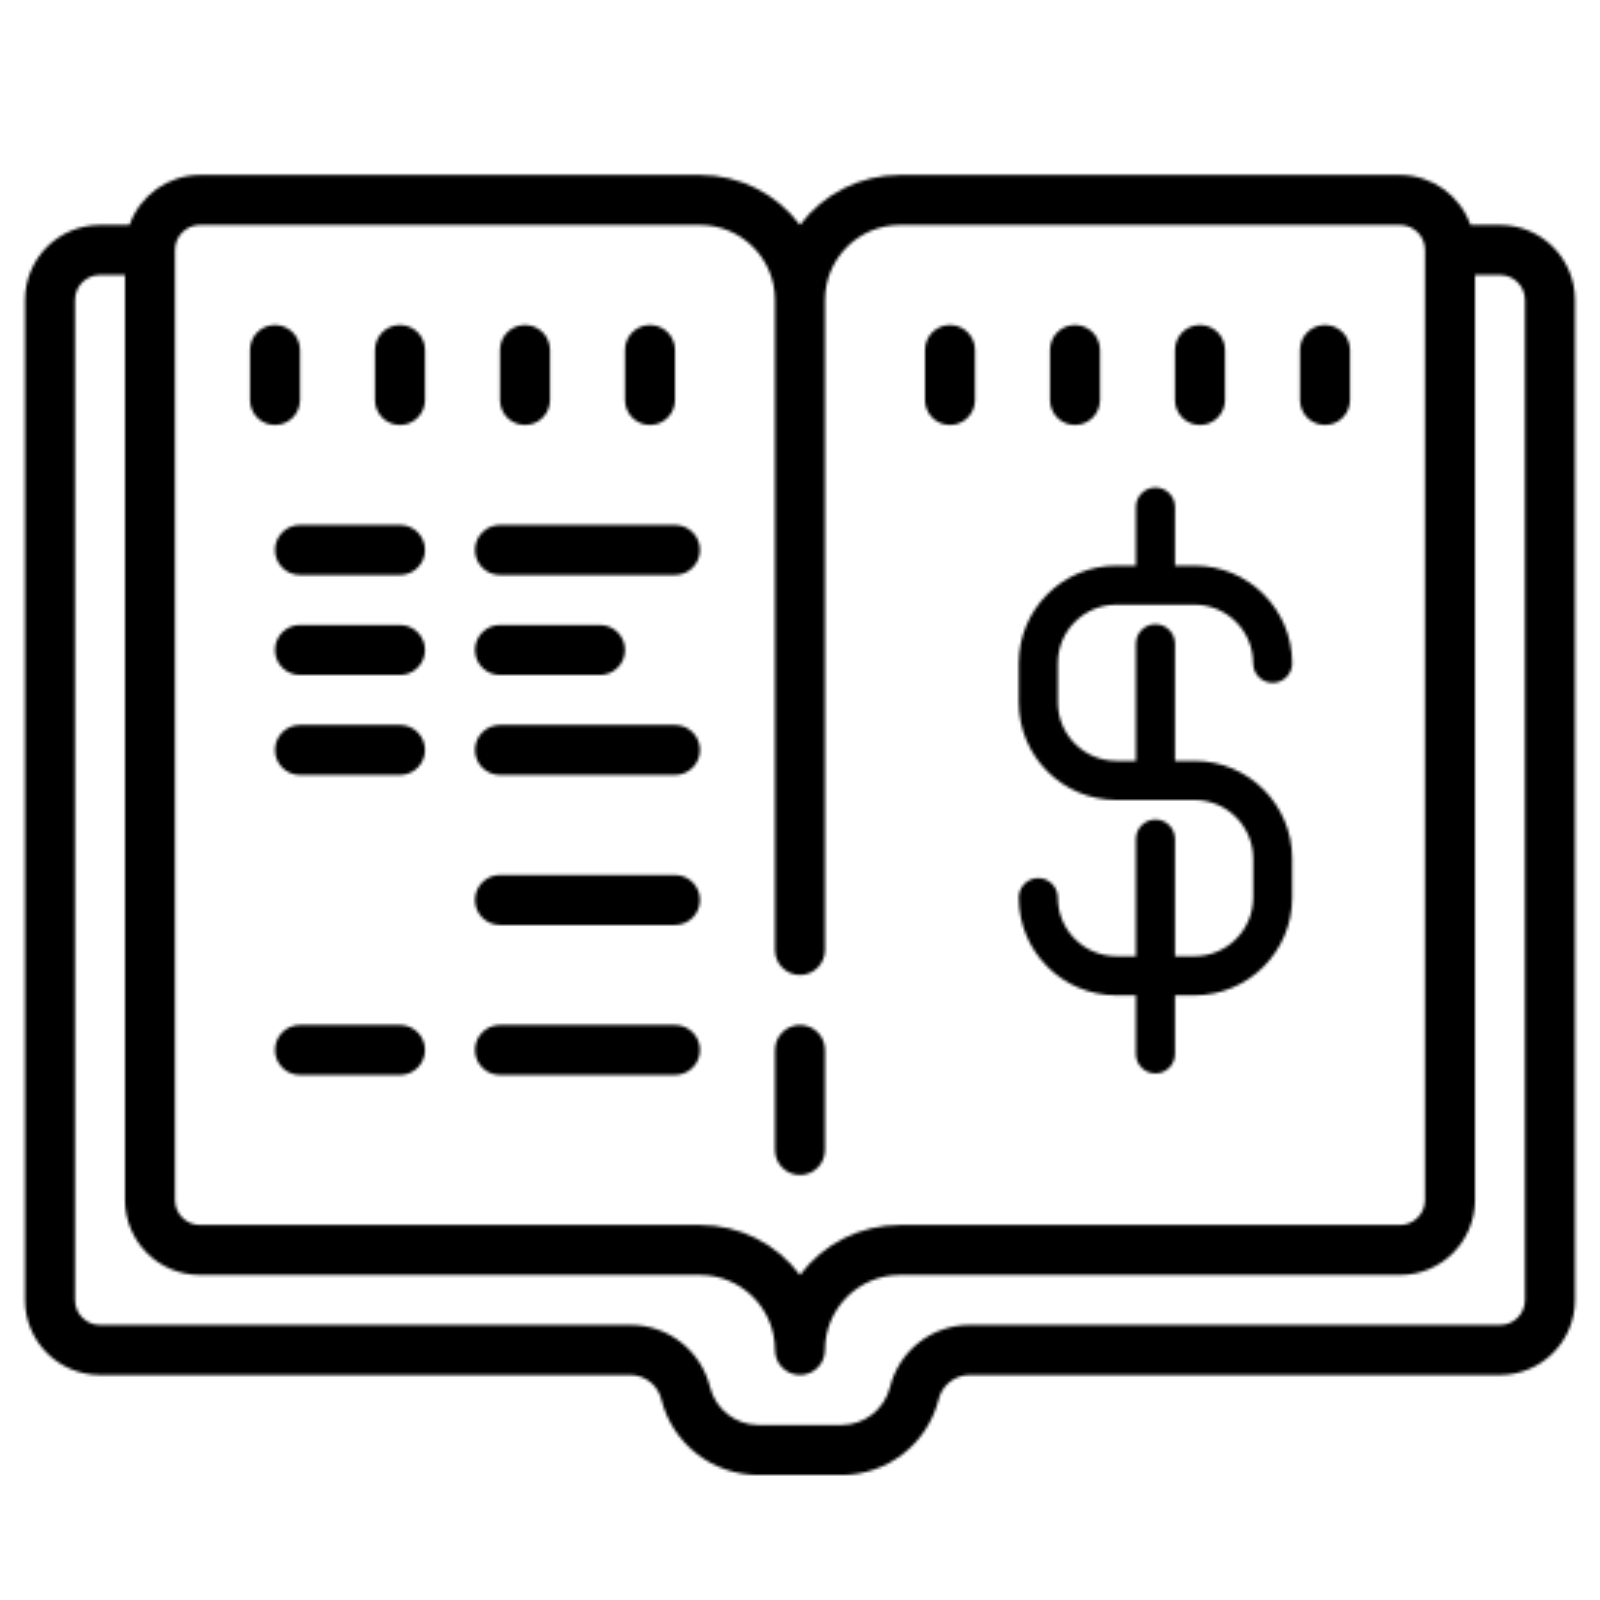 General Ledger icon